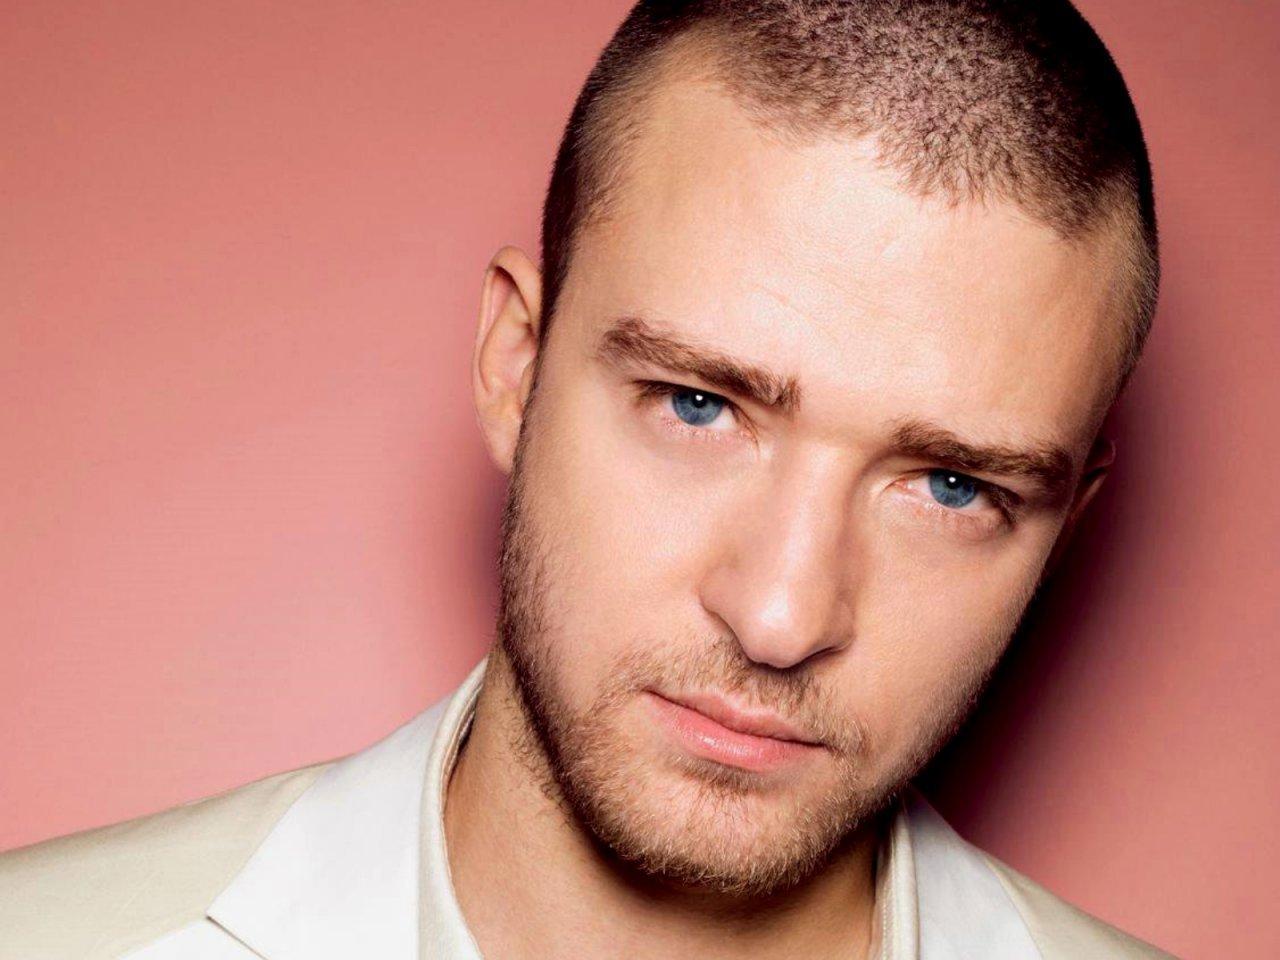 J.T - Justin Timberlake Wallpaper (18476353) - Fanpop